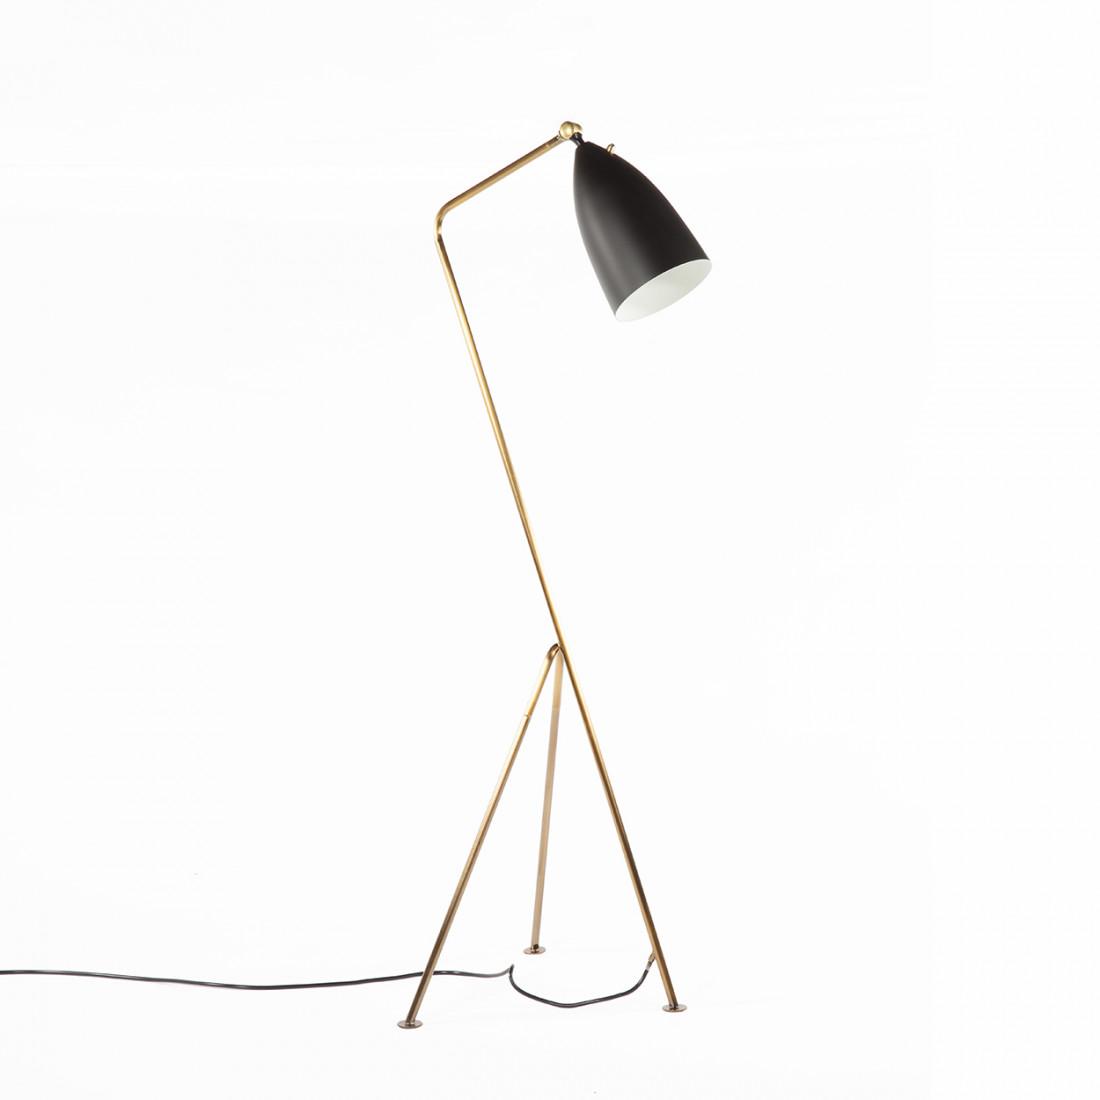 1100x1100 Mid Century Modern Reproduction Grasshopper Floor Lamp